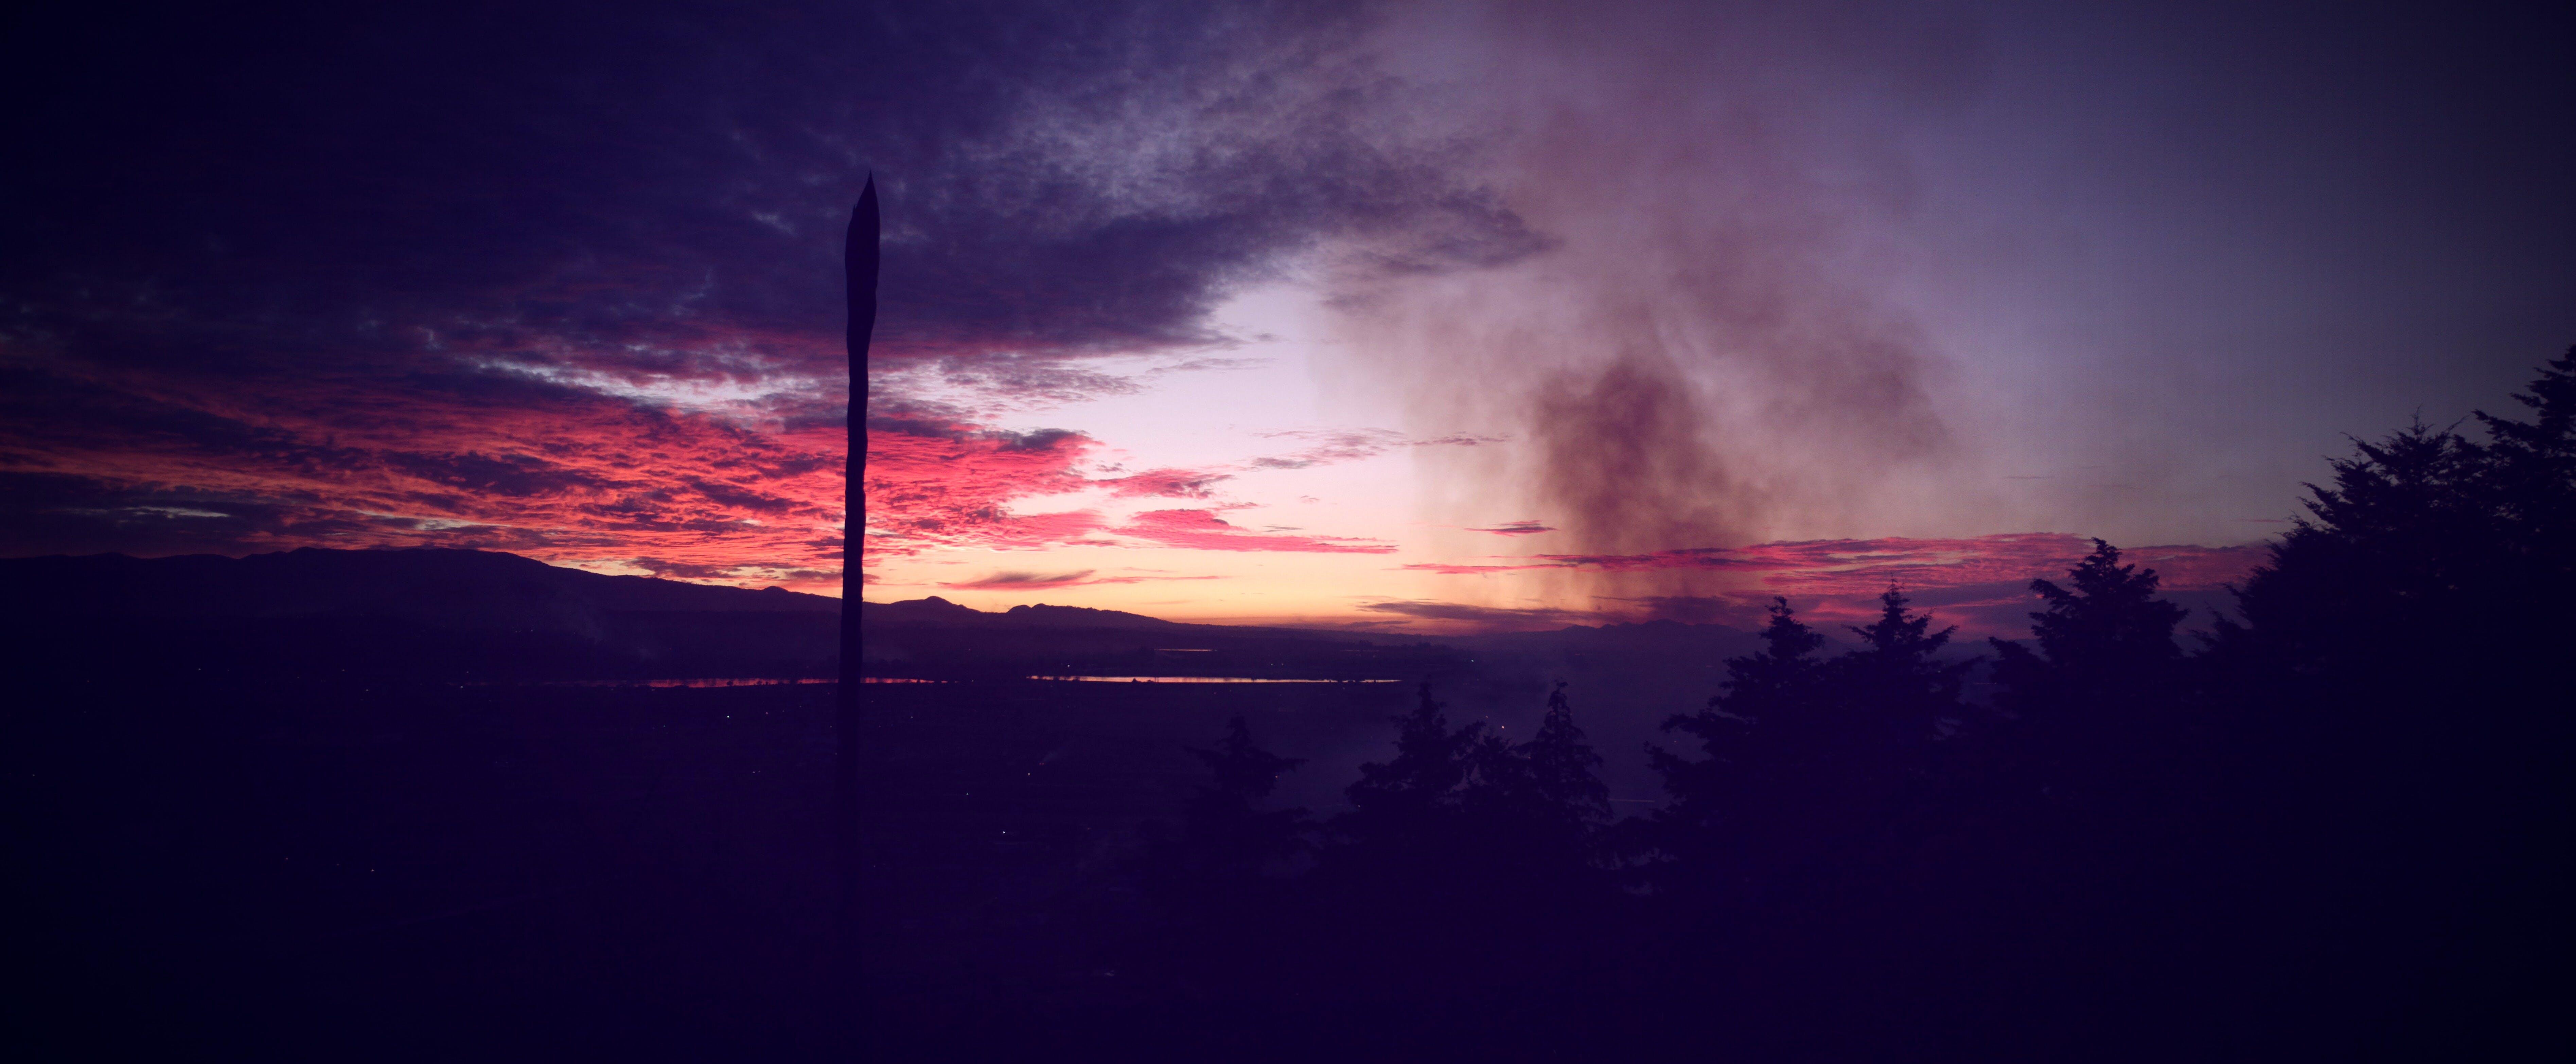 Free stock photo of afternoon, evening, evening sky, evening sun